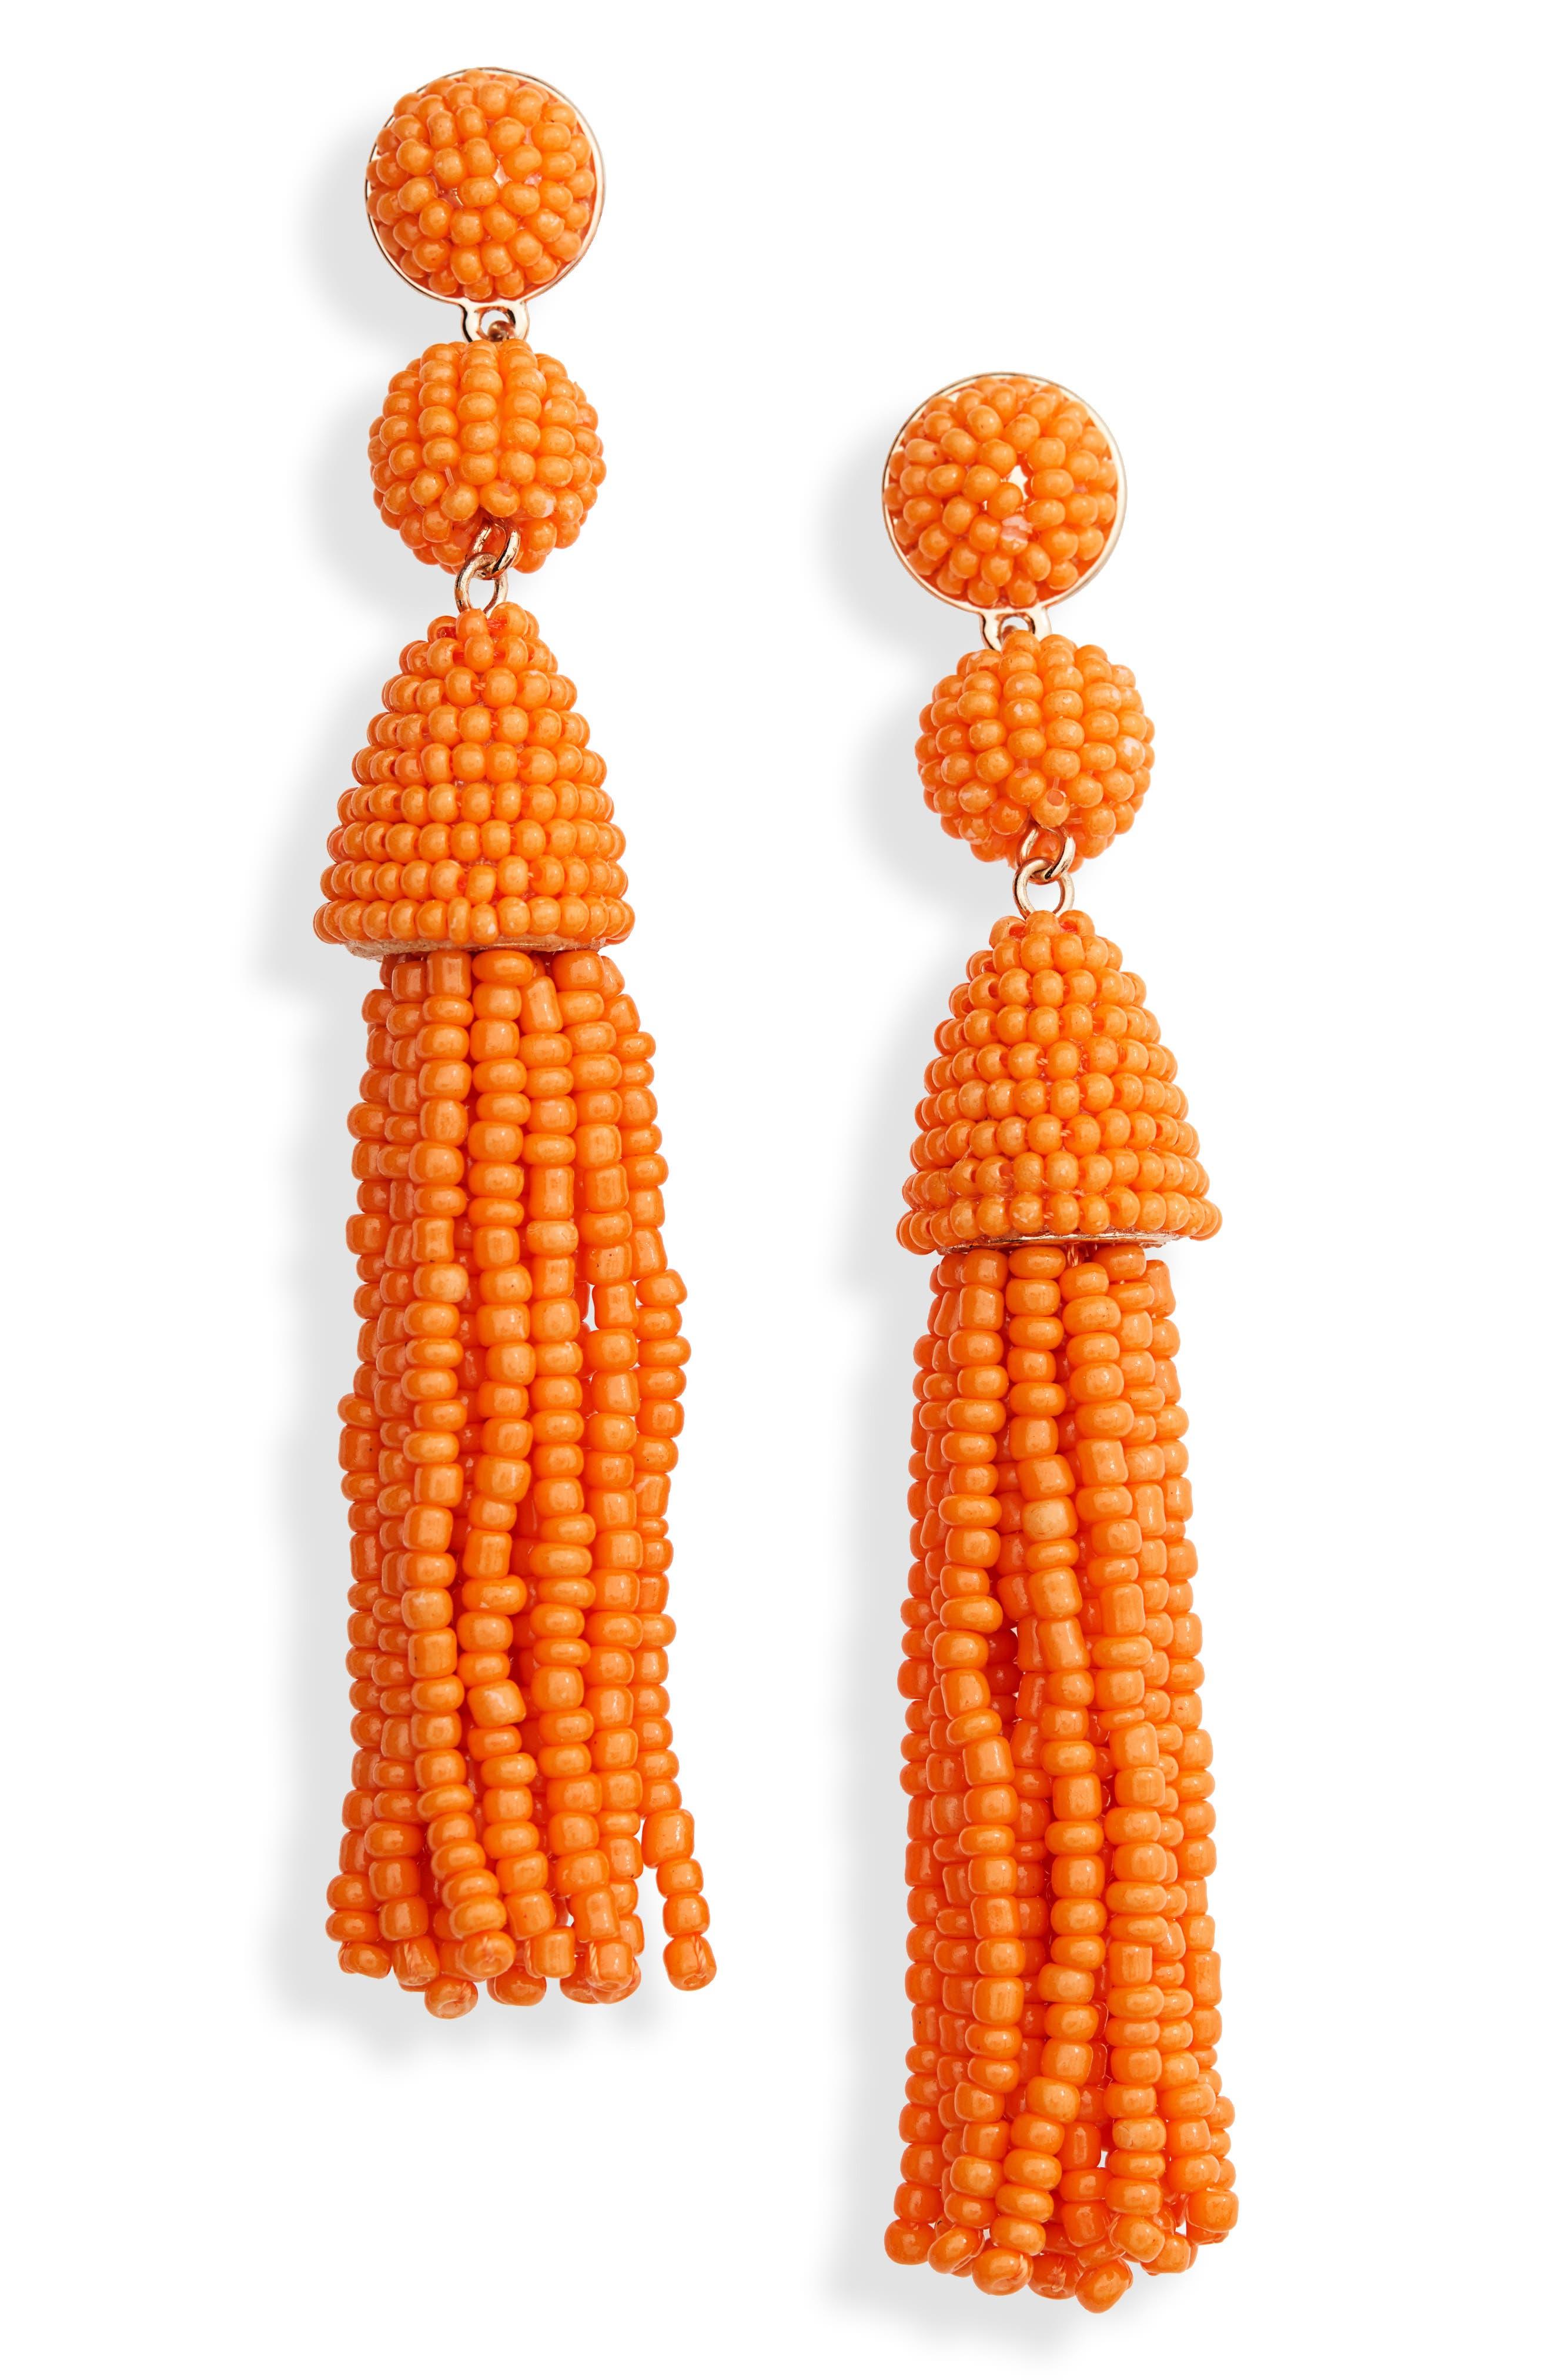 60s -70s Jewelry – Necklaces, Earrings, Rings, Bracelets Womens Baublebar Granita Beaded Tassel Earrings $22.80 AT vintagedancer.com